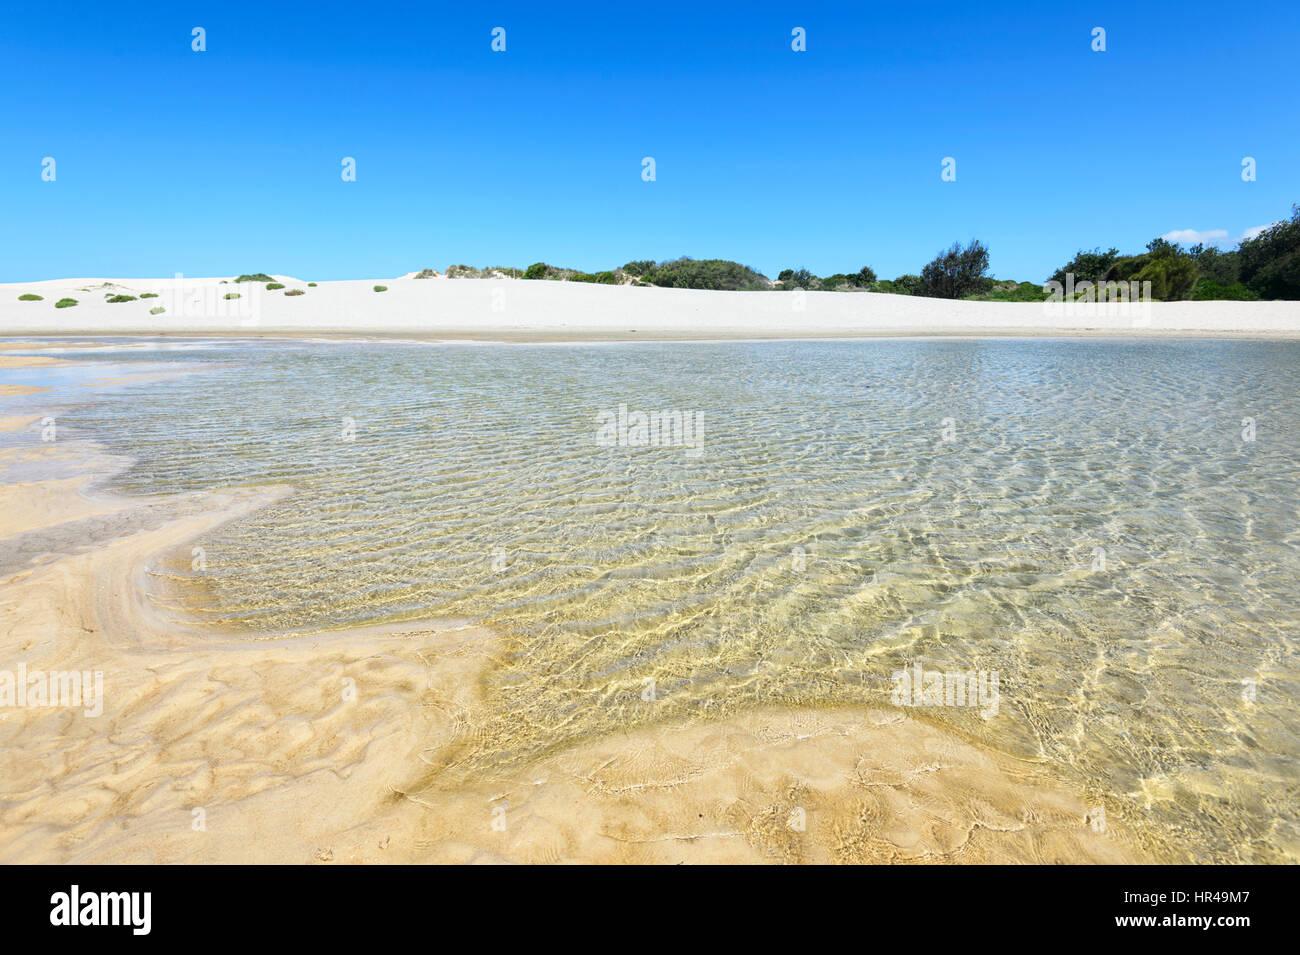 Sand dunes at Conjola Beach, Shoalhaven, South Coast, New South Wales, NSW, Australia - Stock Image